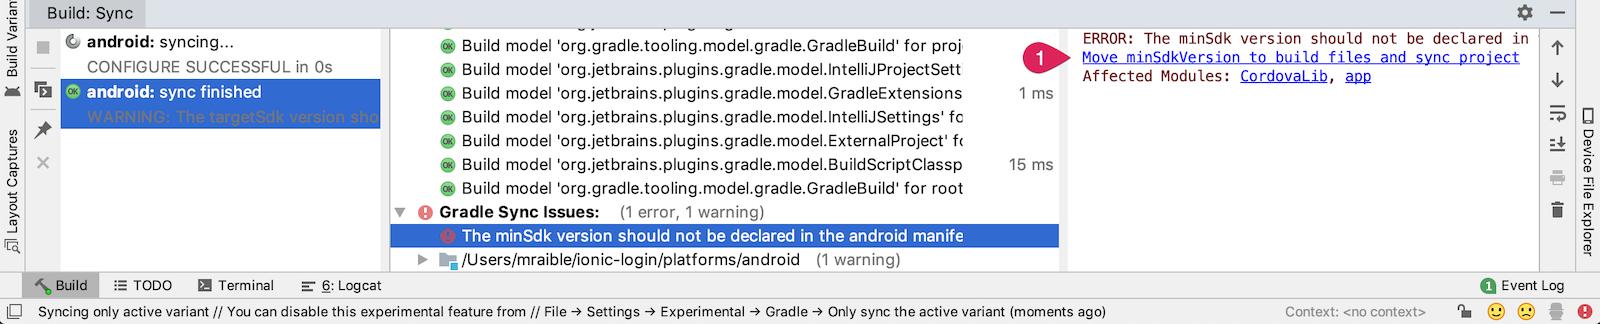 Android Studio Sync error